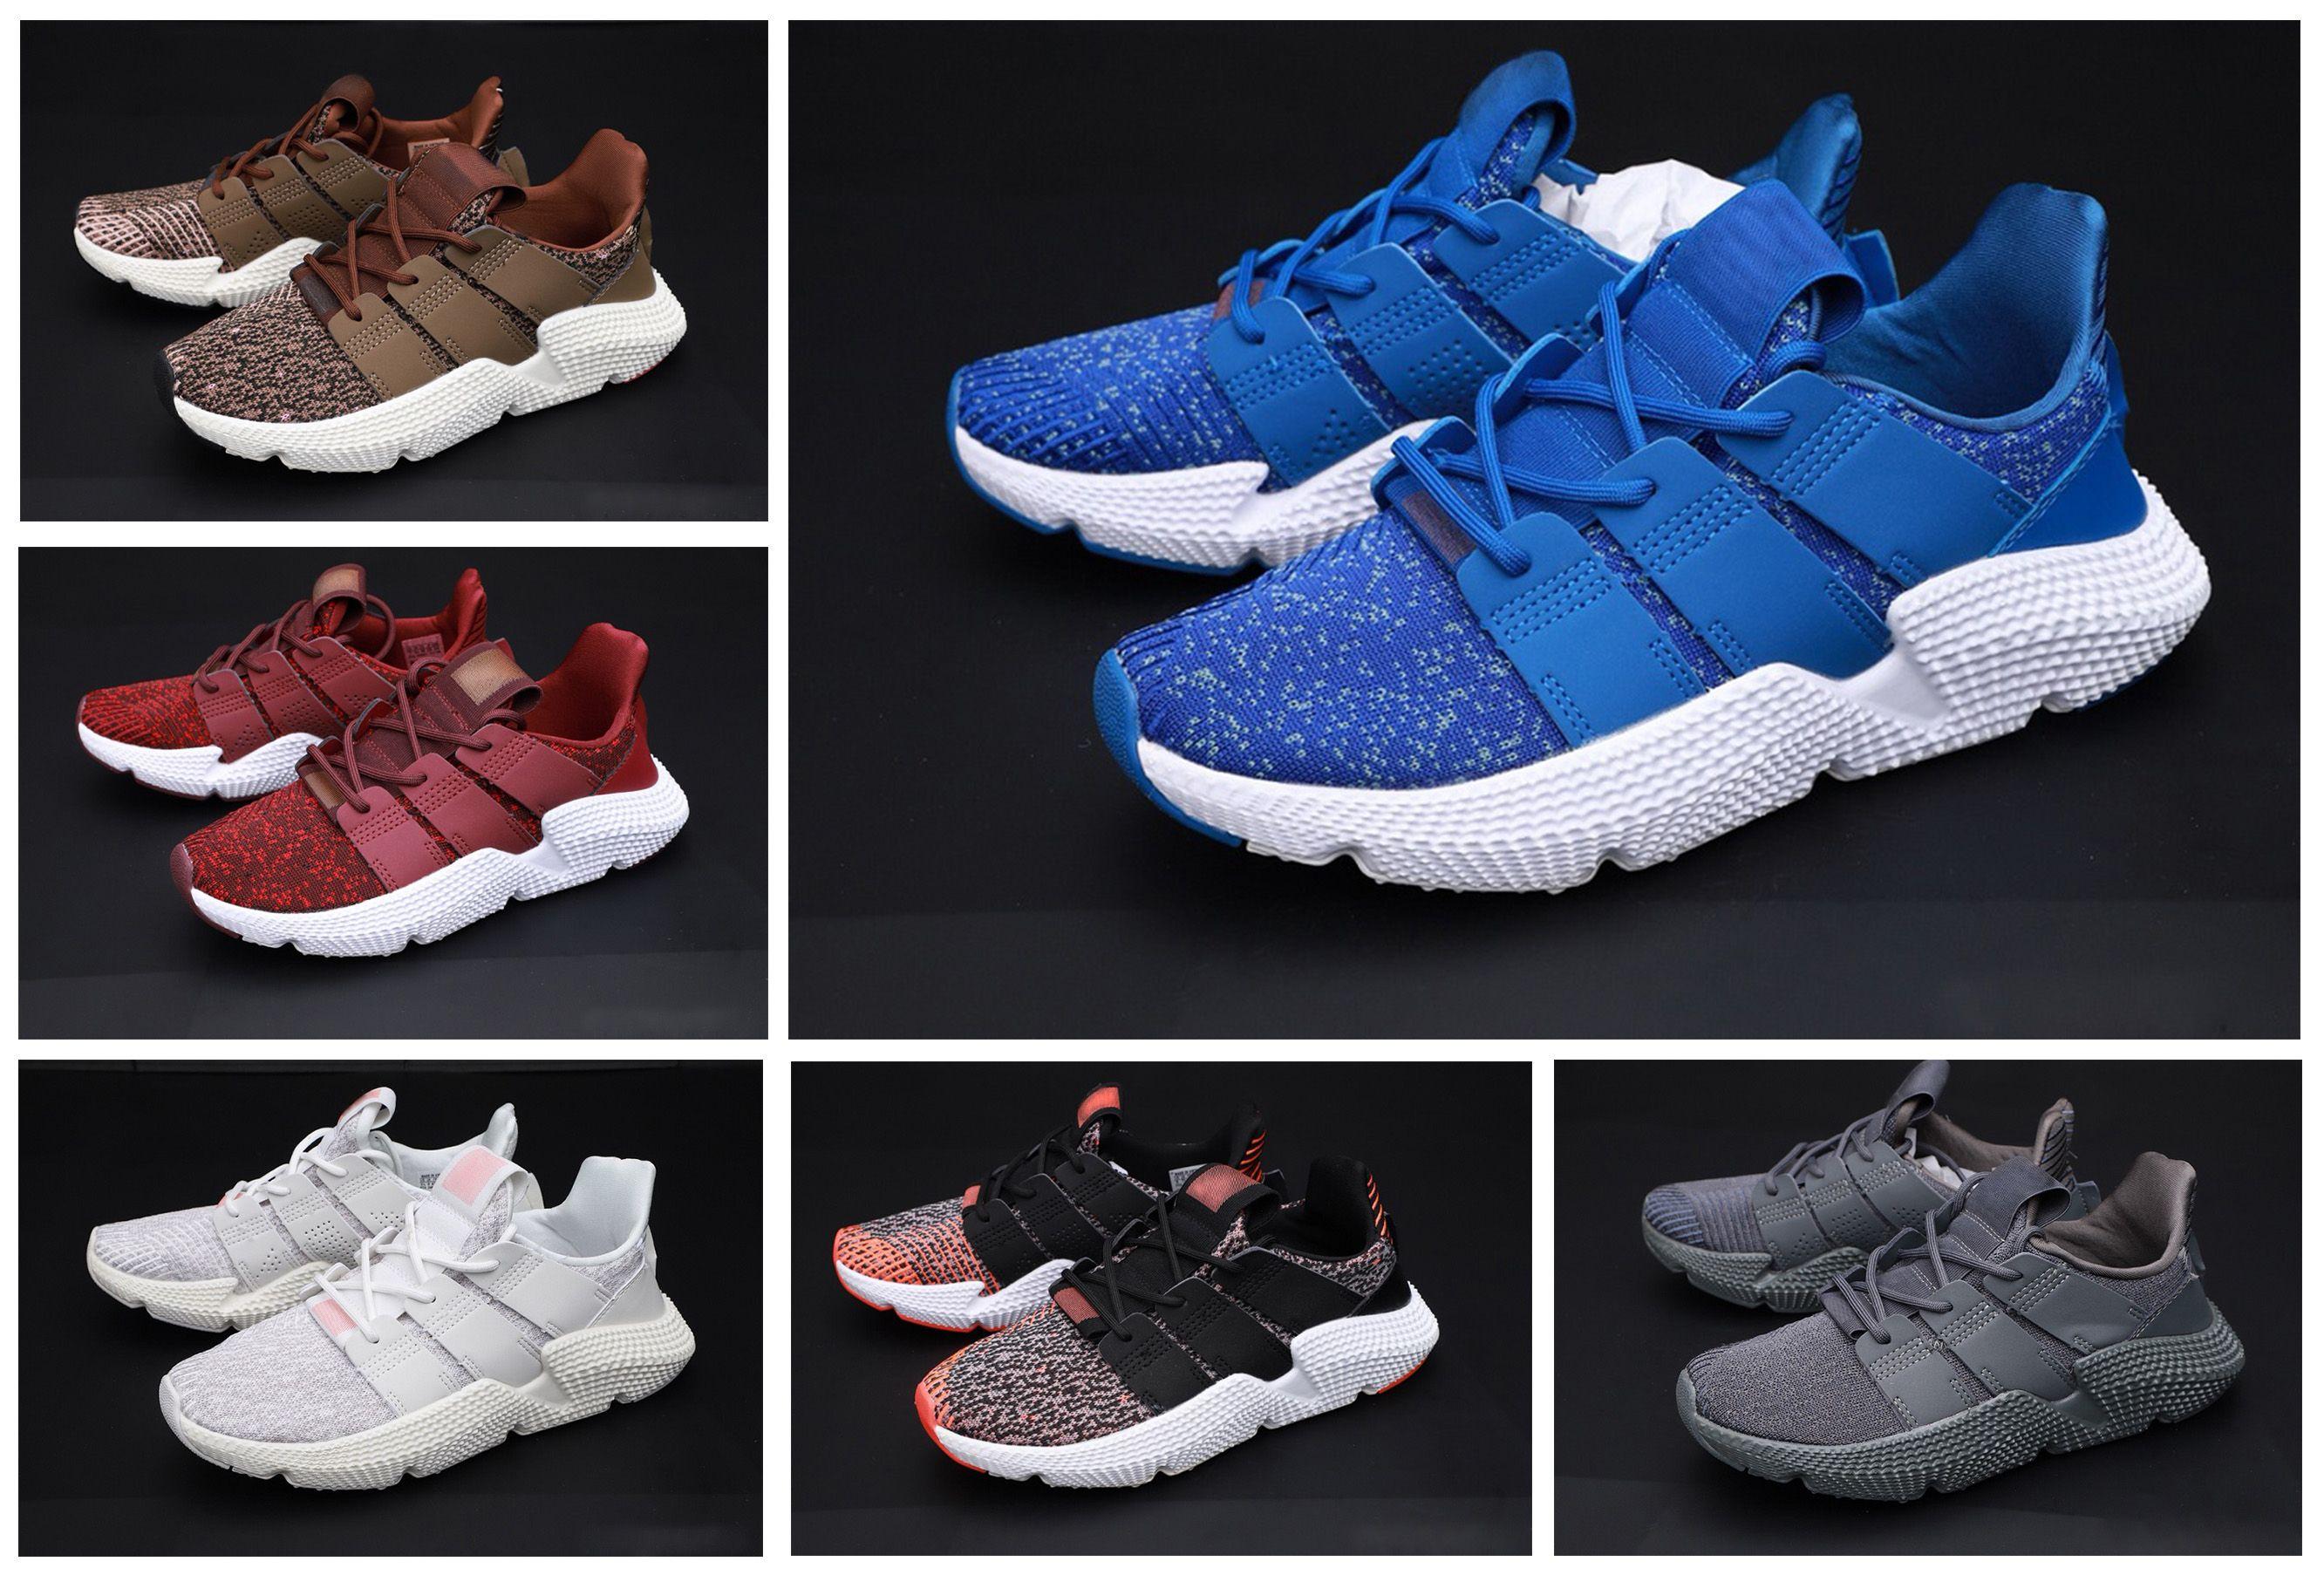 Originals Zapatos Compre Climacool Adidas Para Correr Prophere aOOn0W7